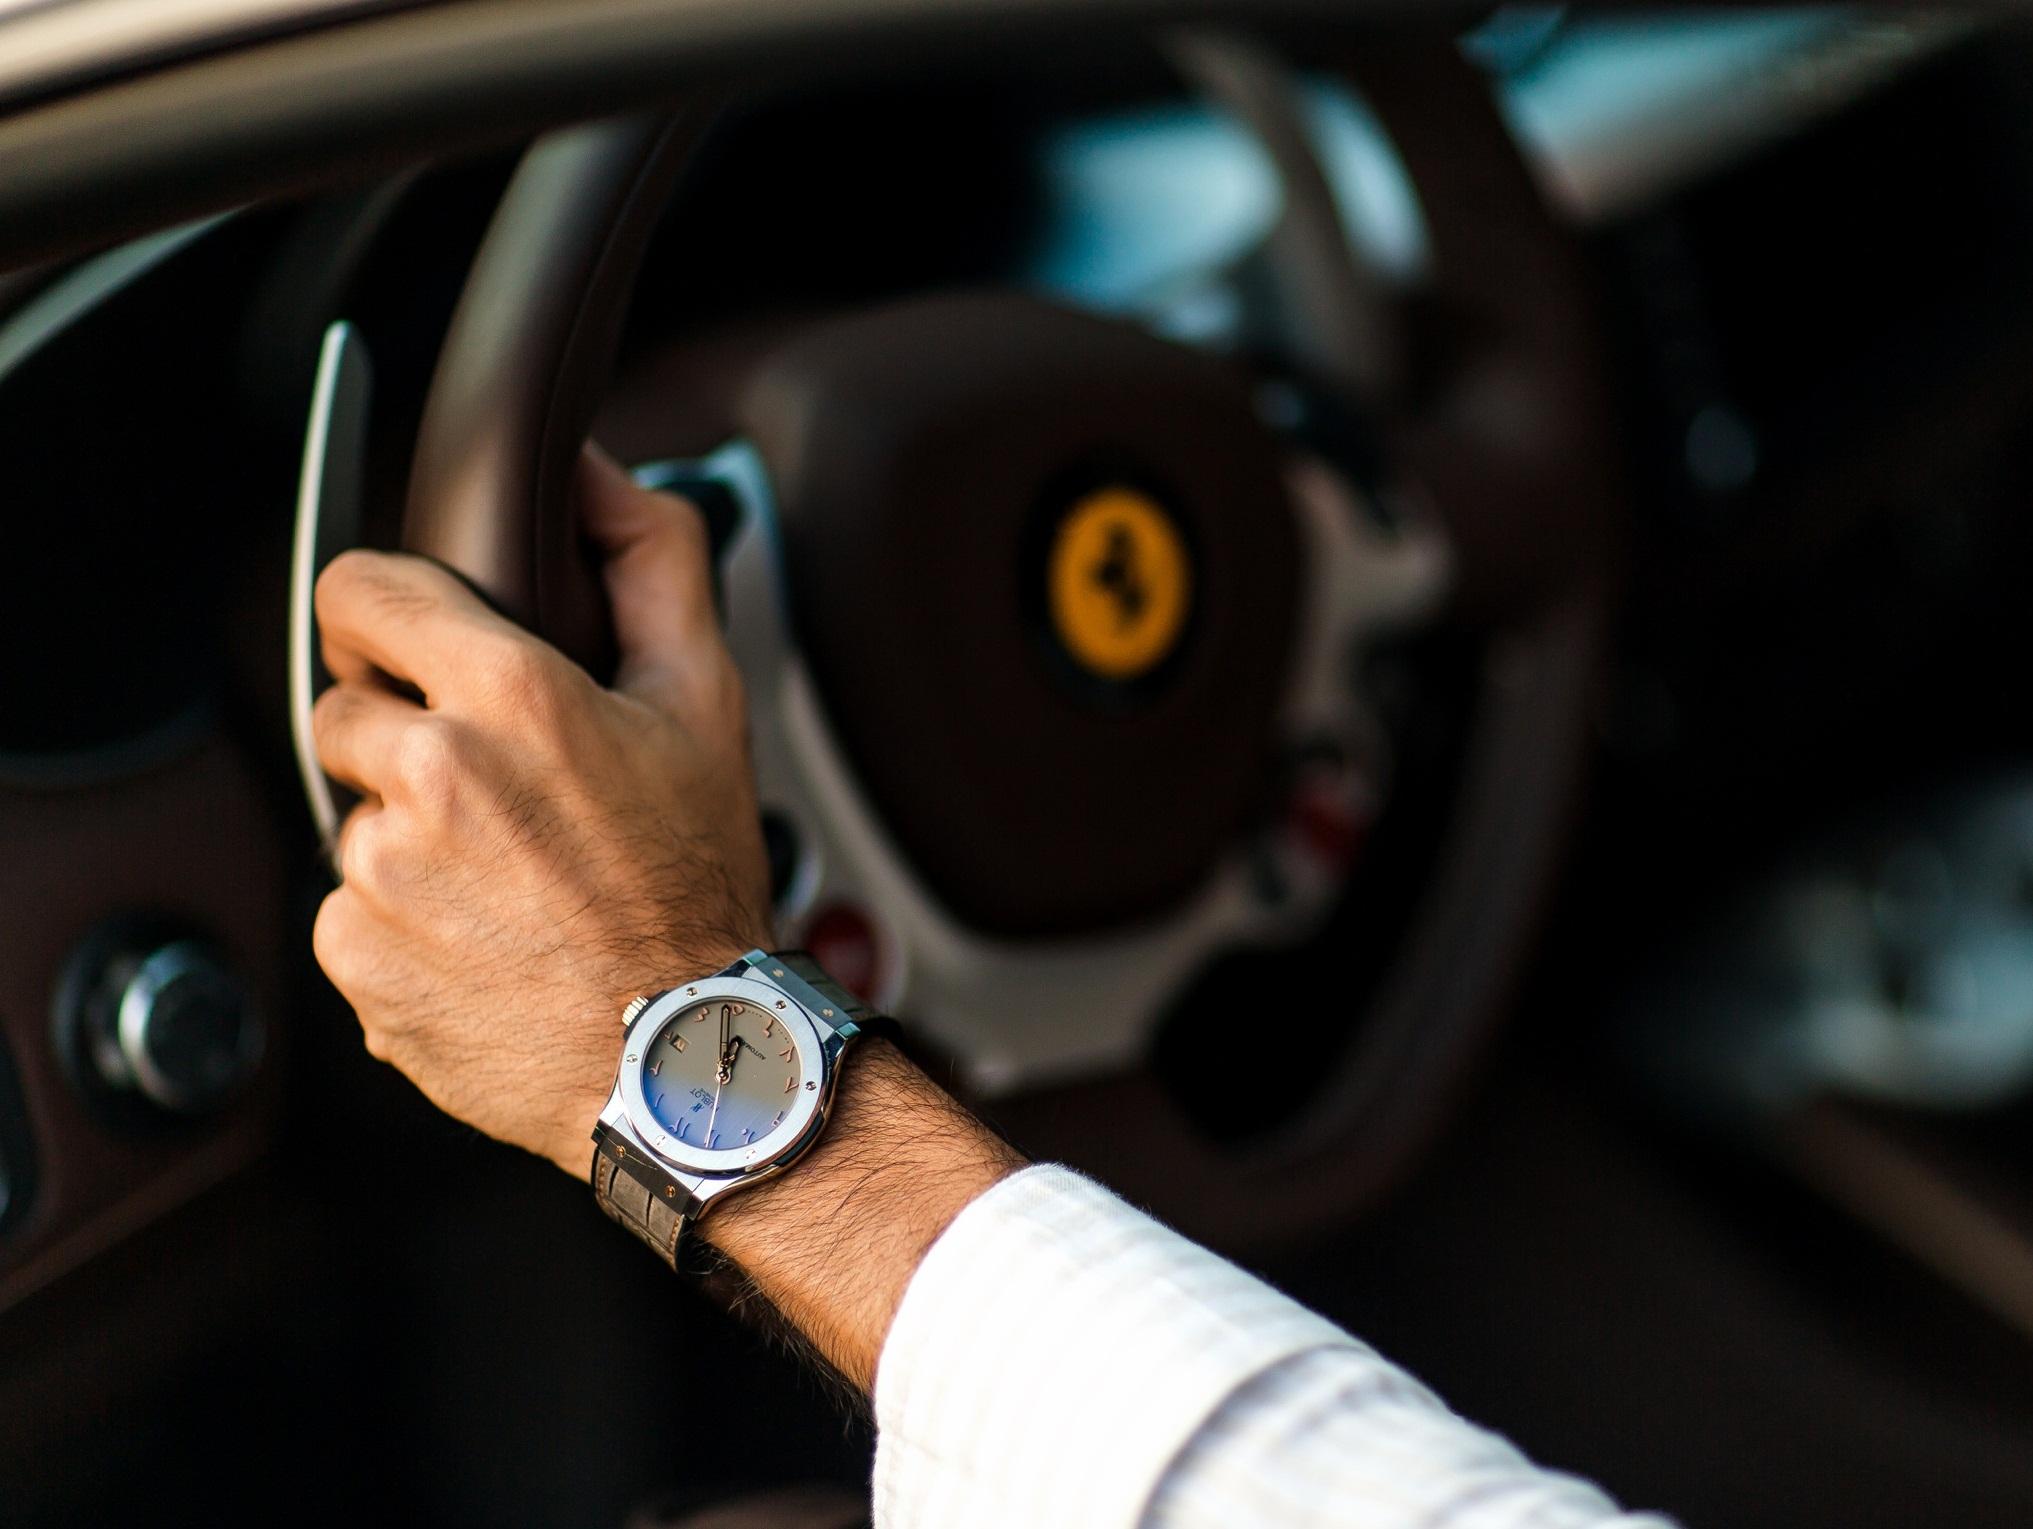 Как выбрать мужчине часы